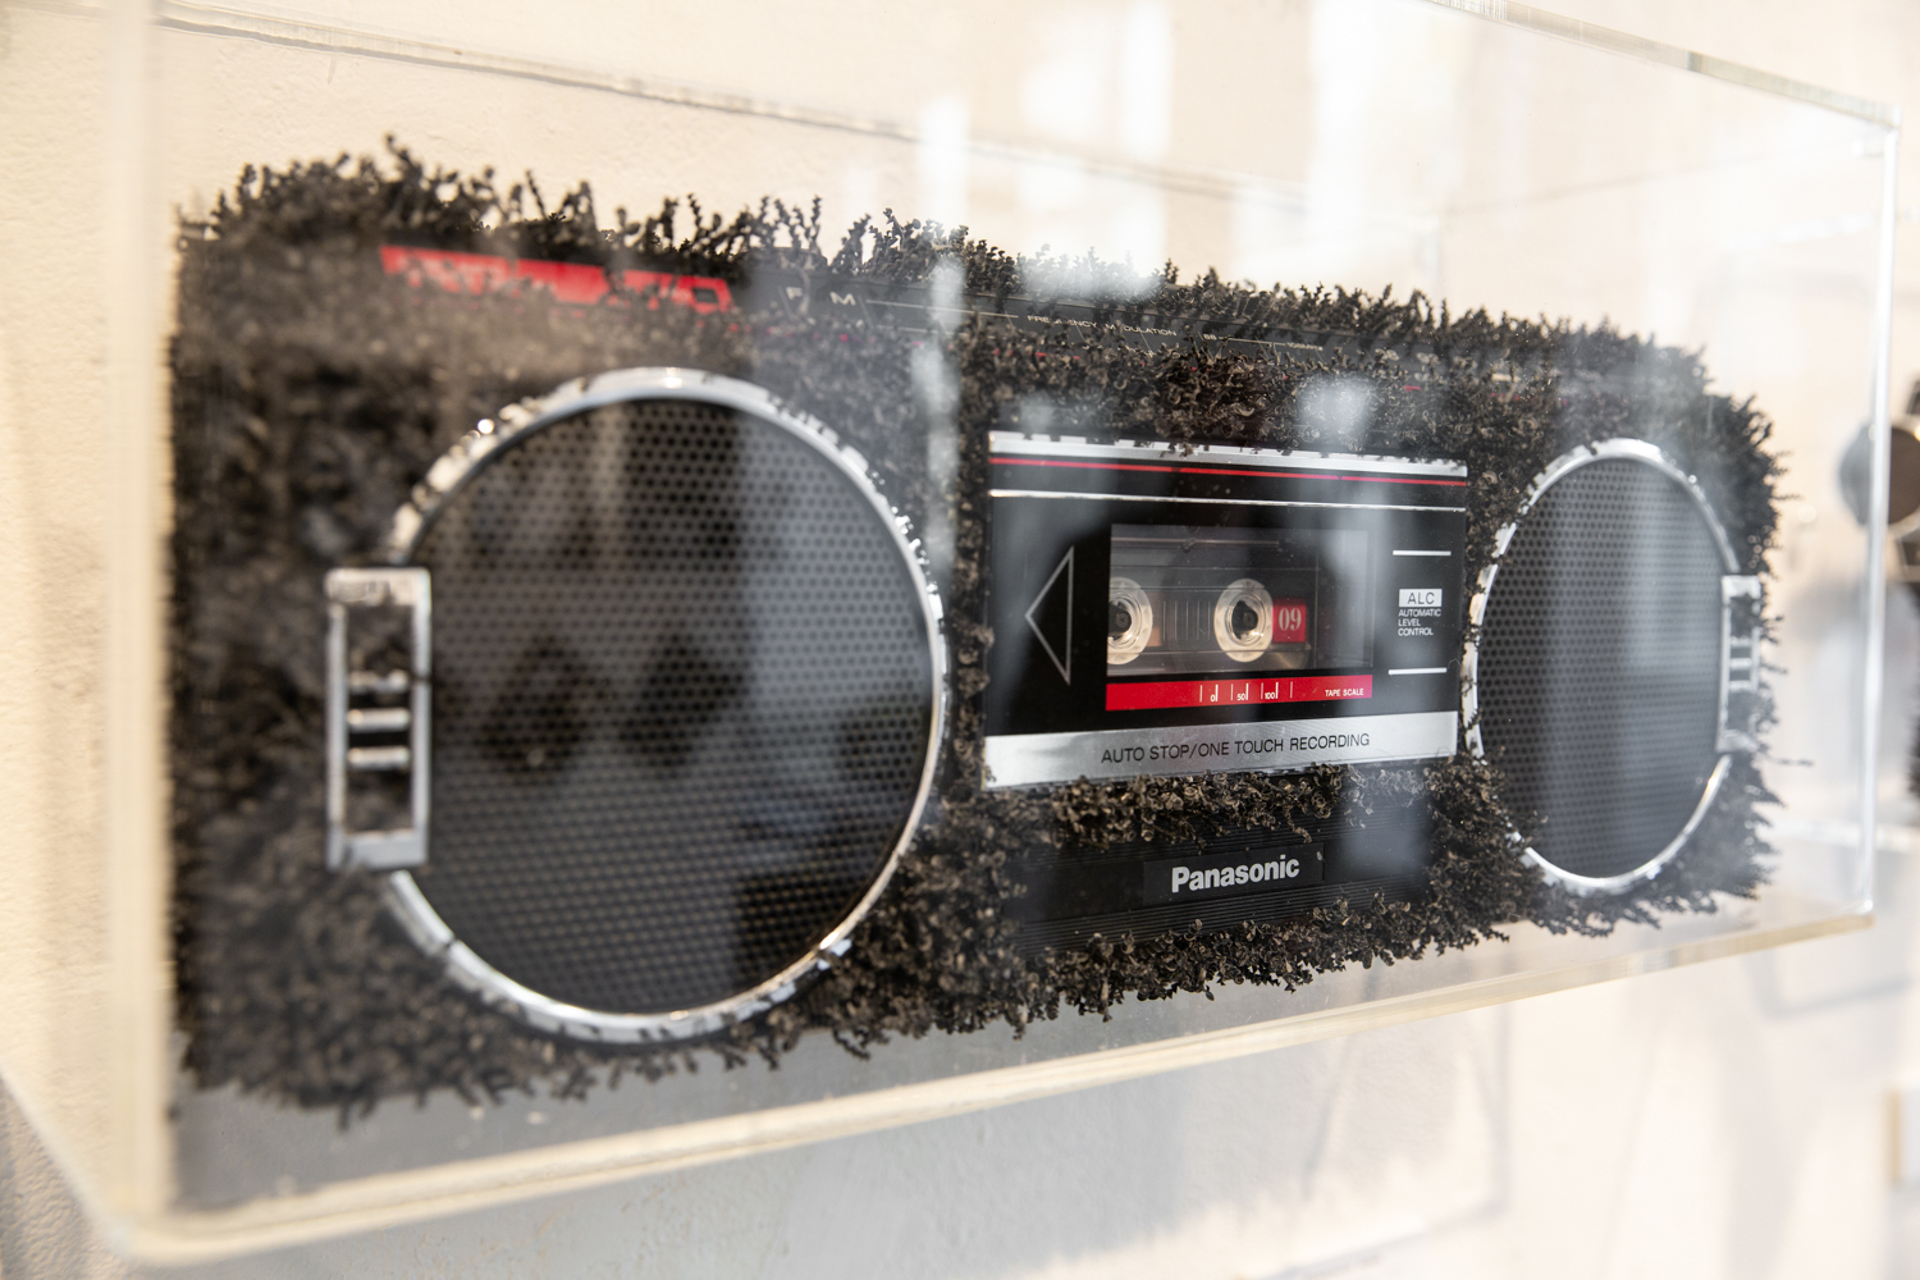 The Mix of Mixtapes by François Arès